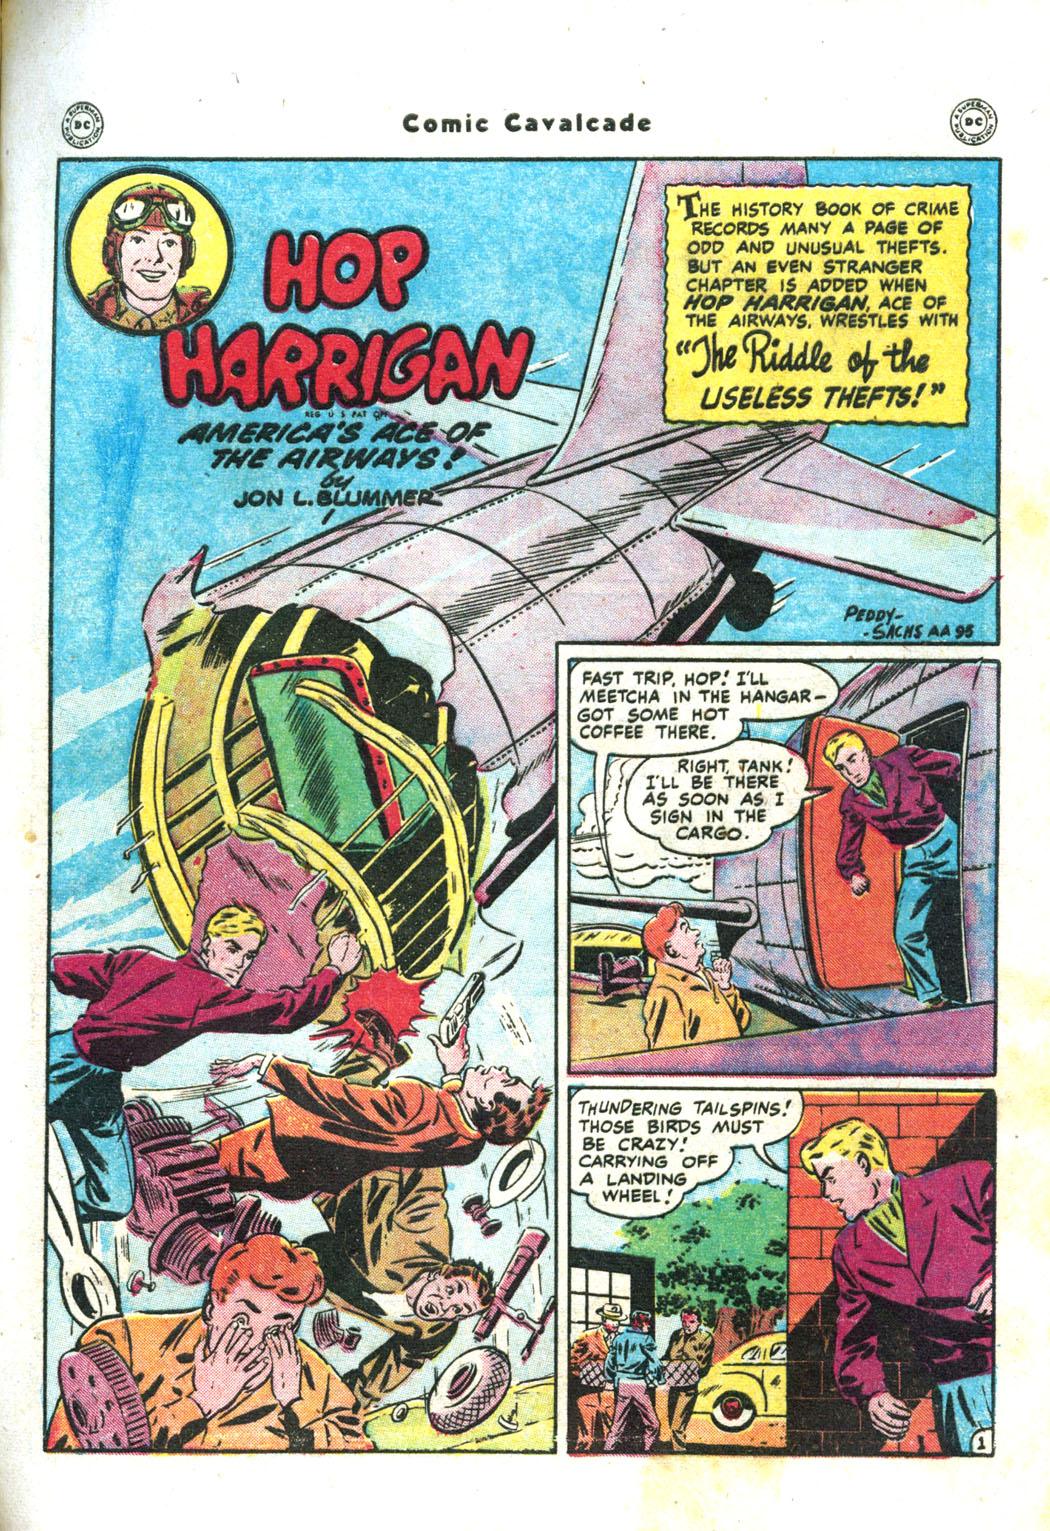 Comic Cavalcade issue 26 - Page 49